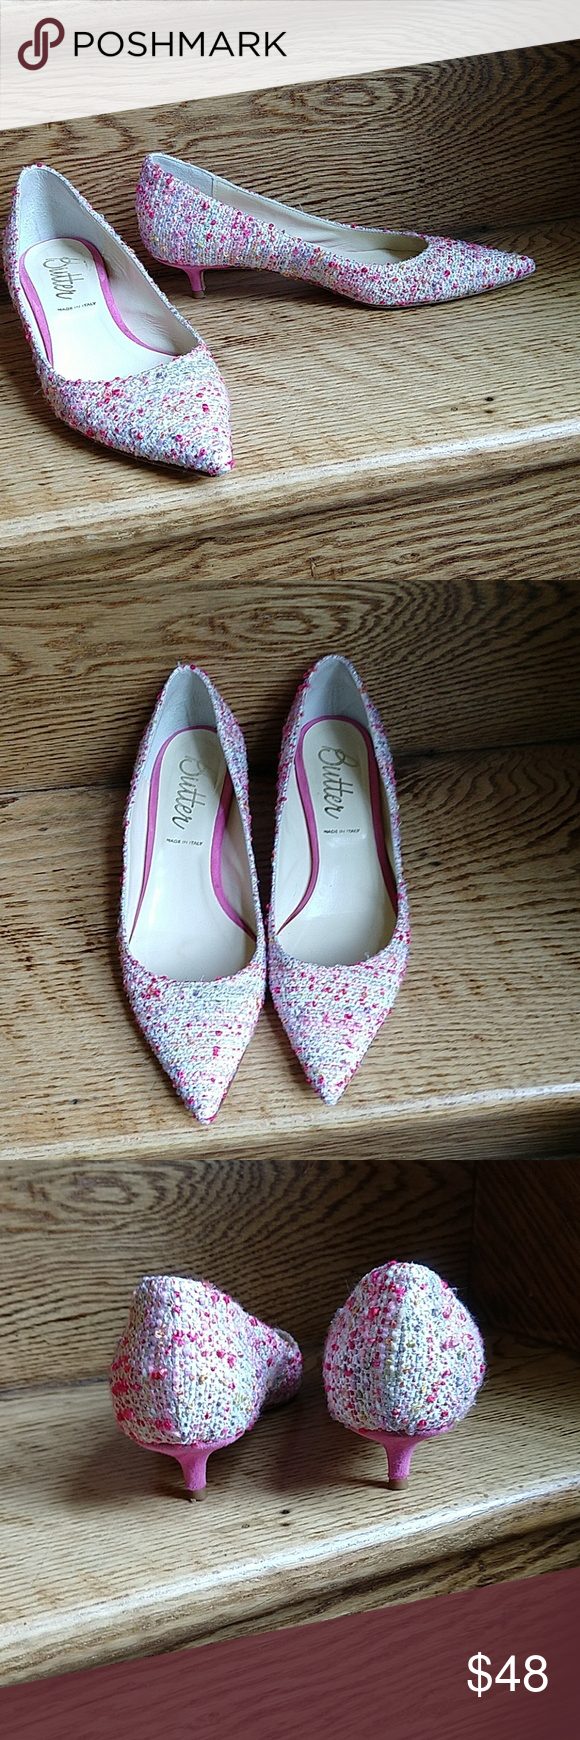 Butter Pink Tweed Kitten Heels Size 6 Kitten Heels Butter Shoes Kitten Heel Pumps